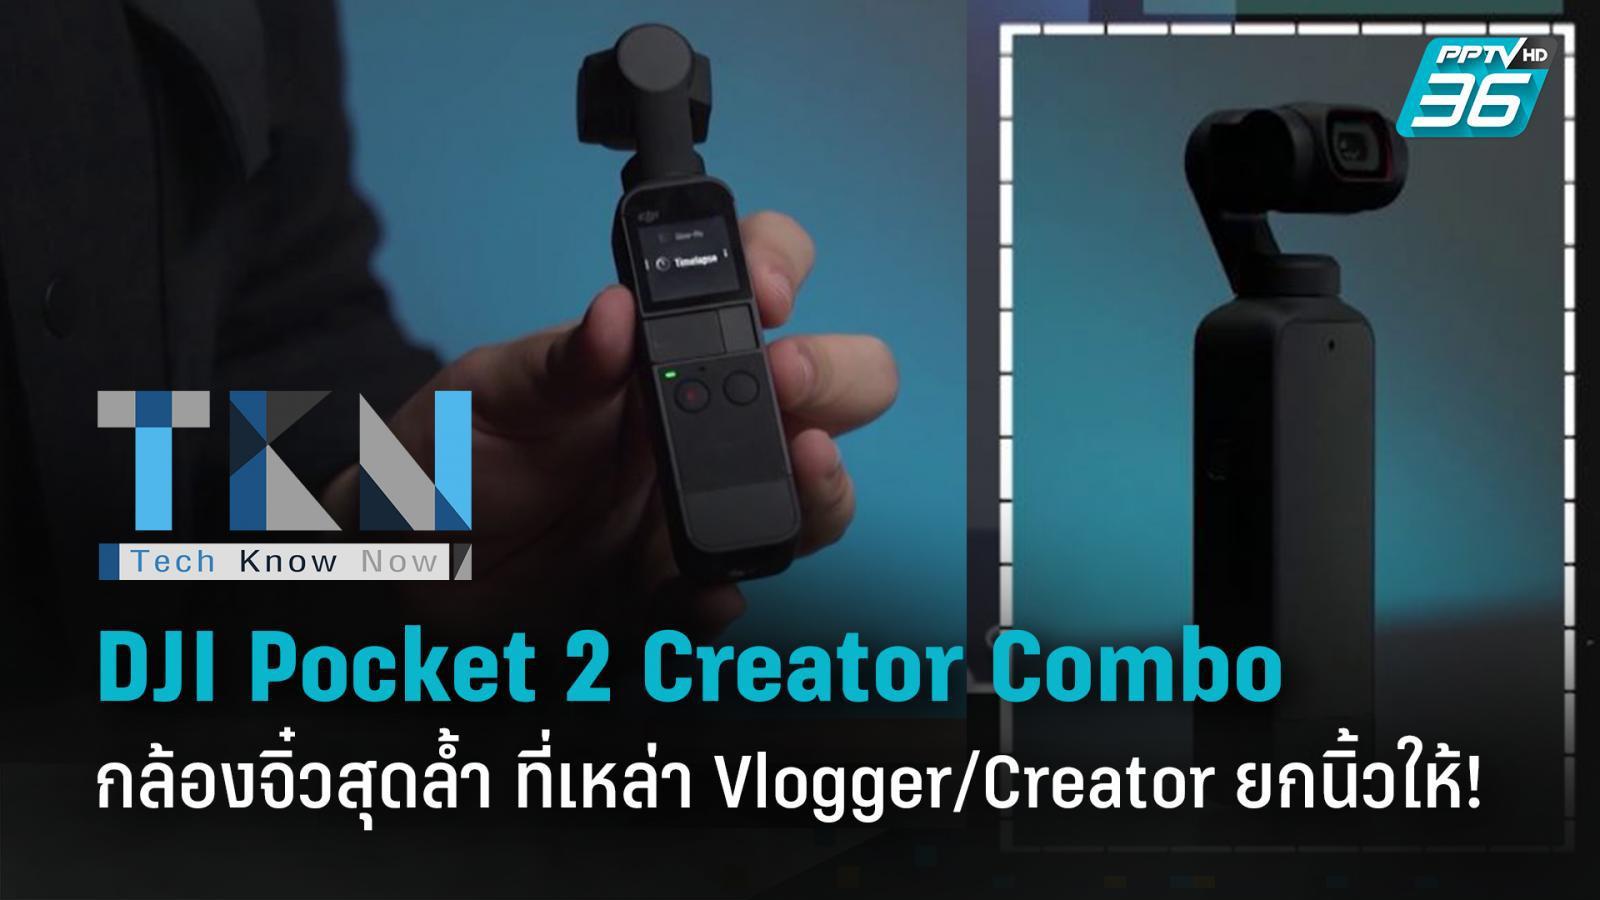 """DJI Pocket 2 Creator Combo""กล้องจิ๋วสุดล้ำ ที่เหล่า Vlogger และ Creator ยกนิ้วให้!"